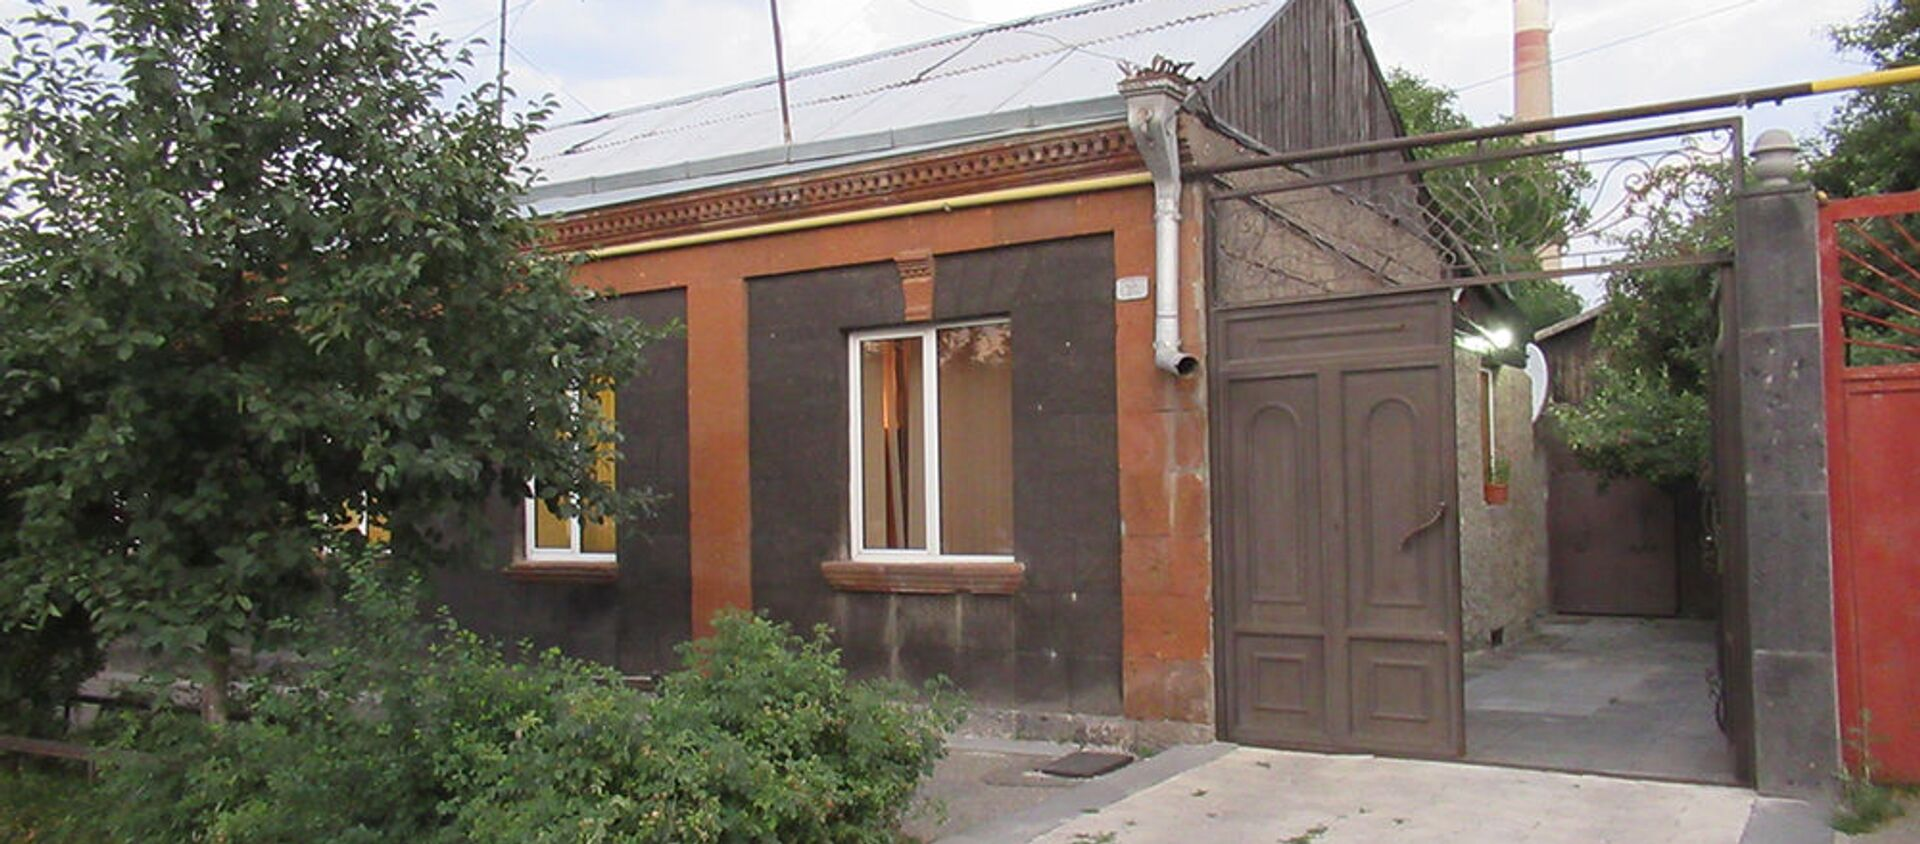 Доме на улице Пароняна в Гюмри - Sputnik Армения, 1920, 21.07.2021